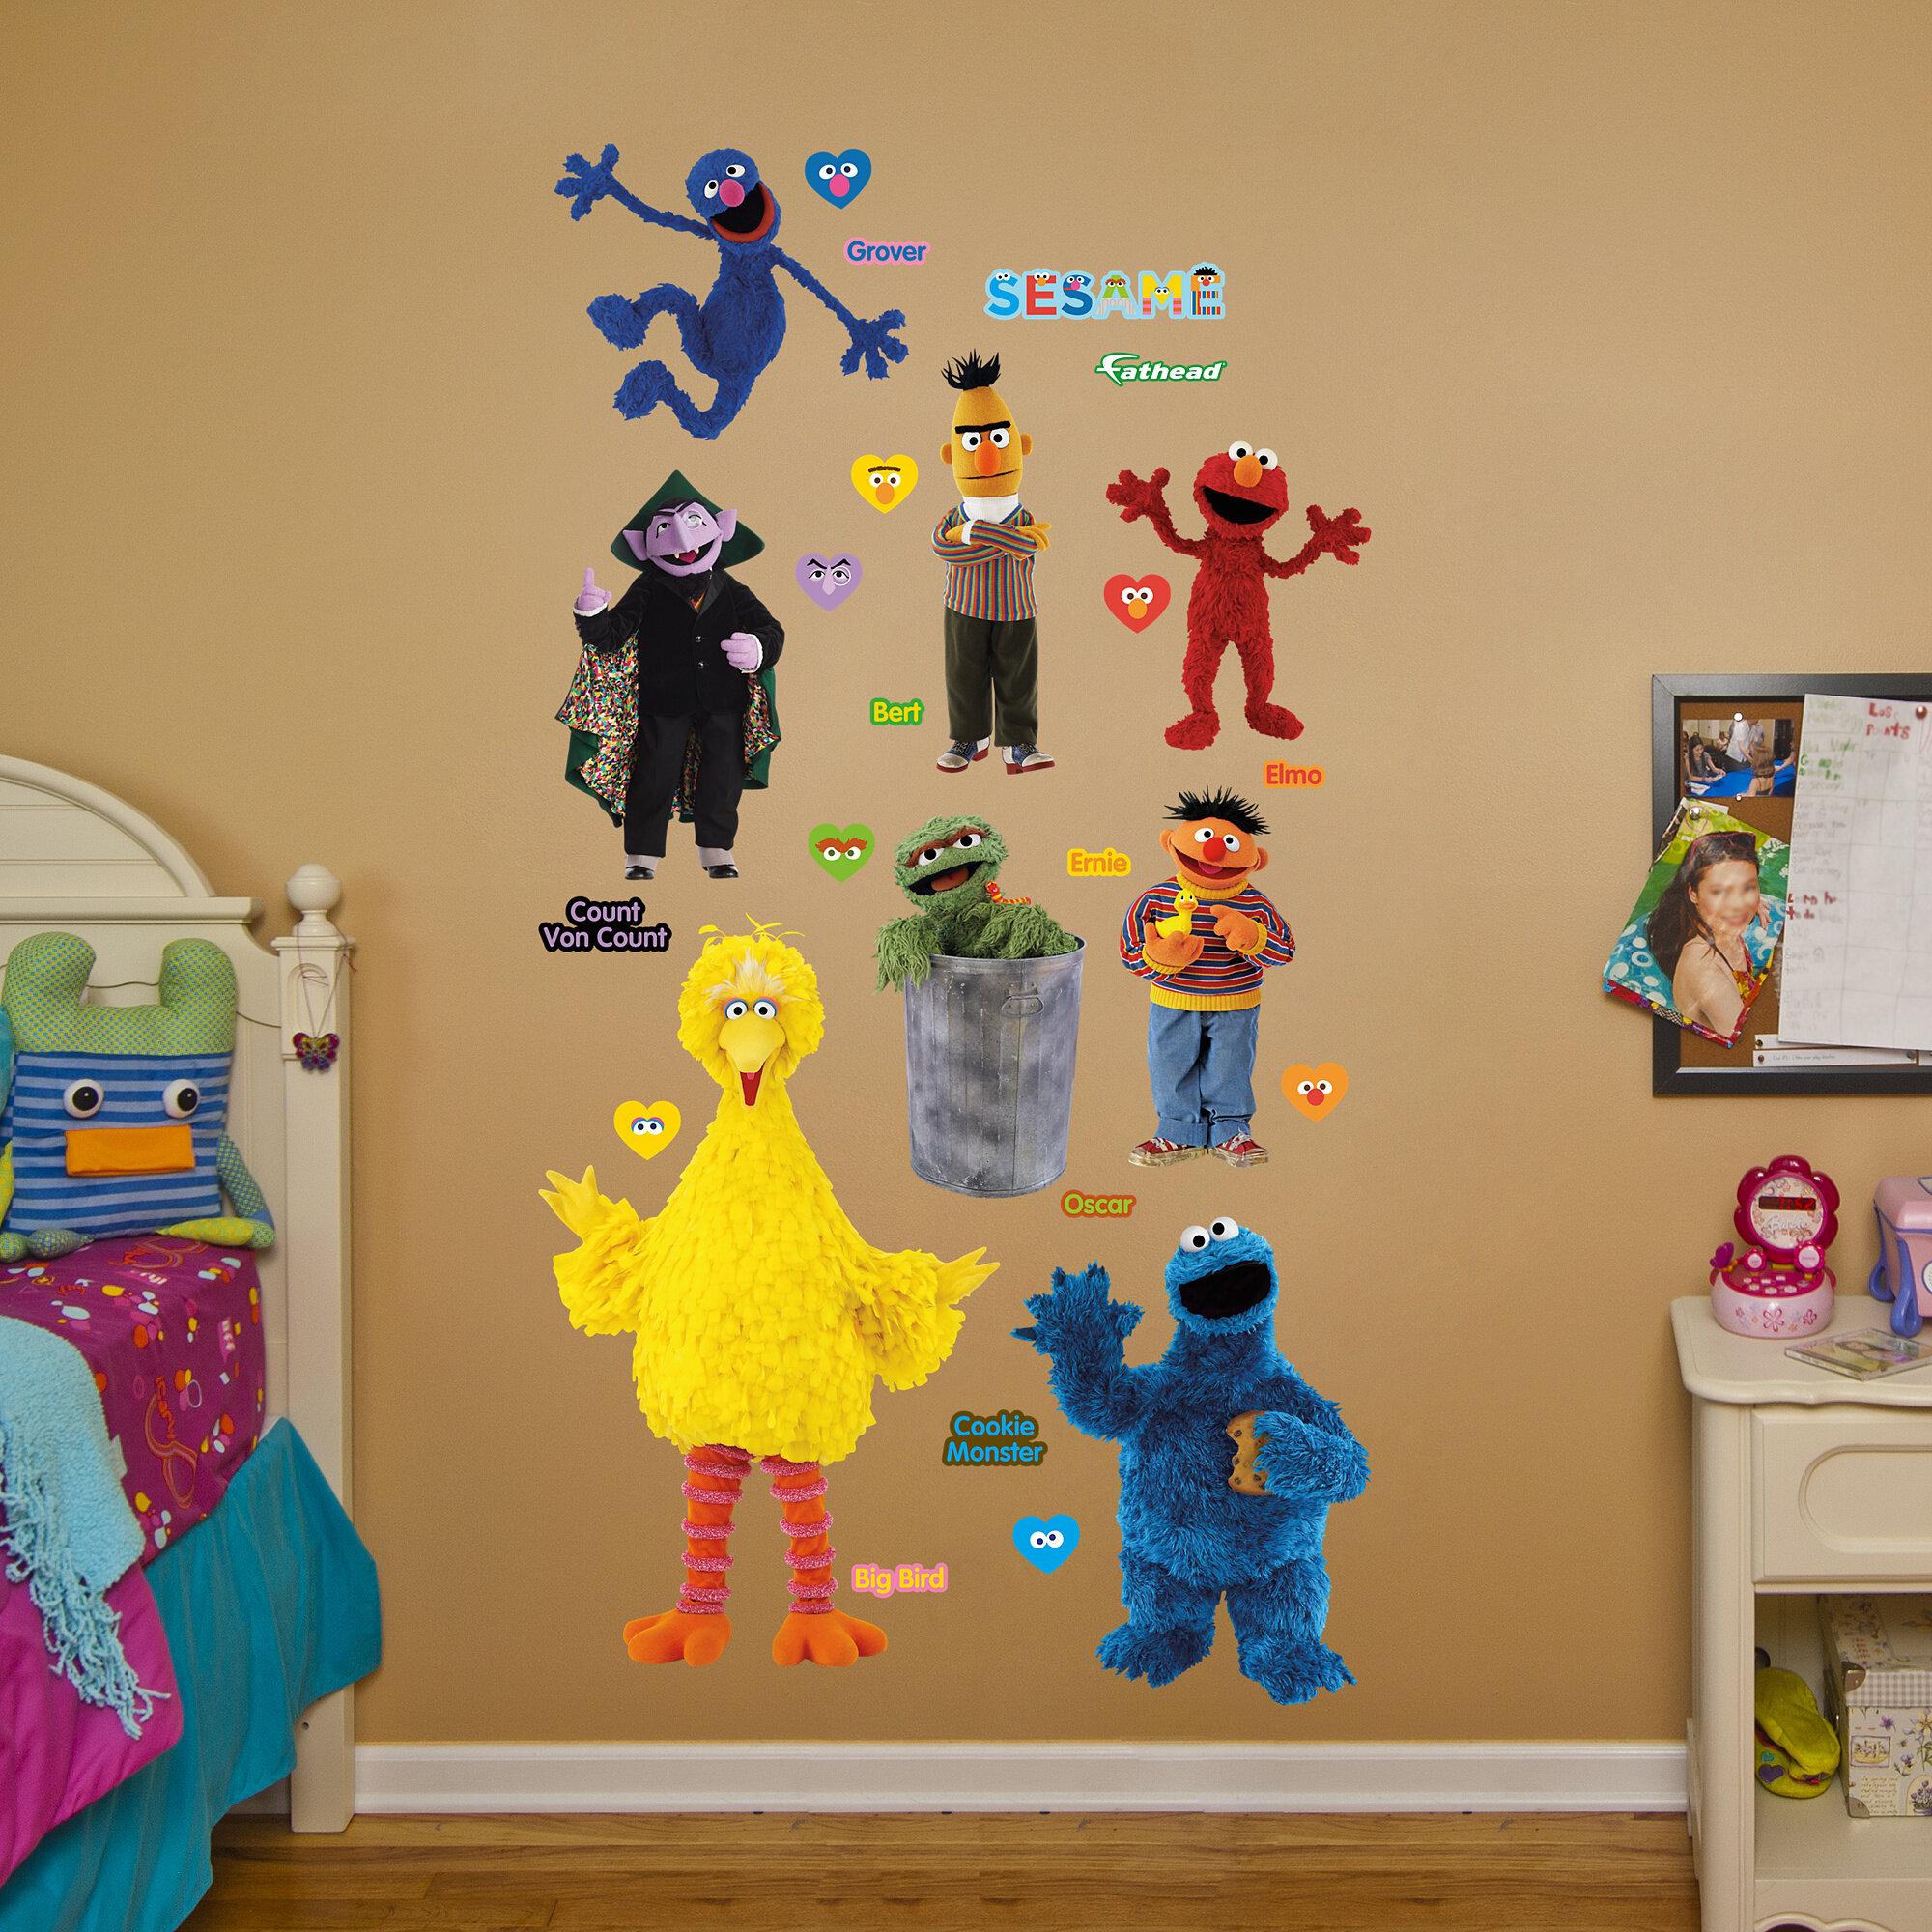 Fathead RealBig Sesame Street Wall Decal | Wayfair